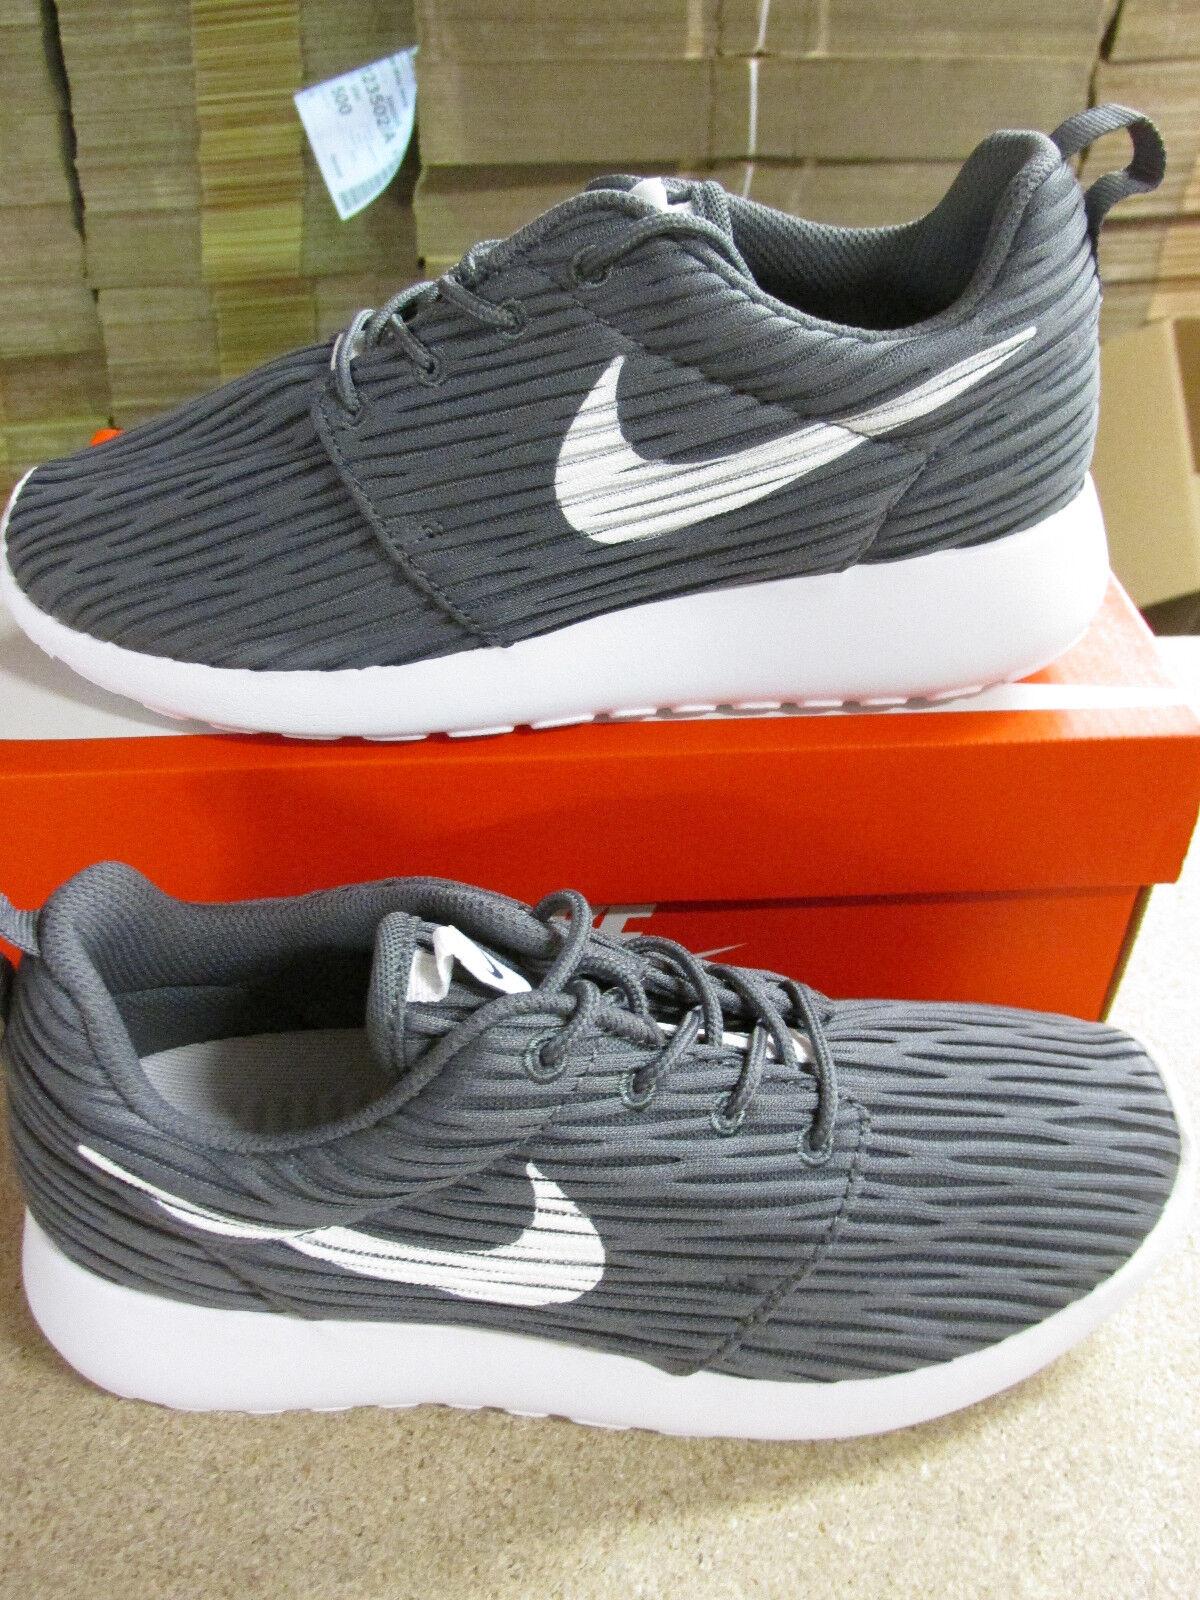 Nike Damenschuhe 833818 Roshe One ENG Running Trainers 833818 Damenschuhe 011 Sneakers Schuhes 3c11cb